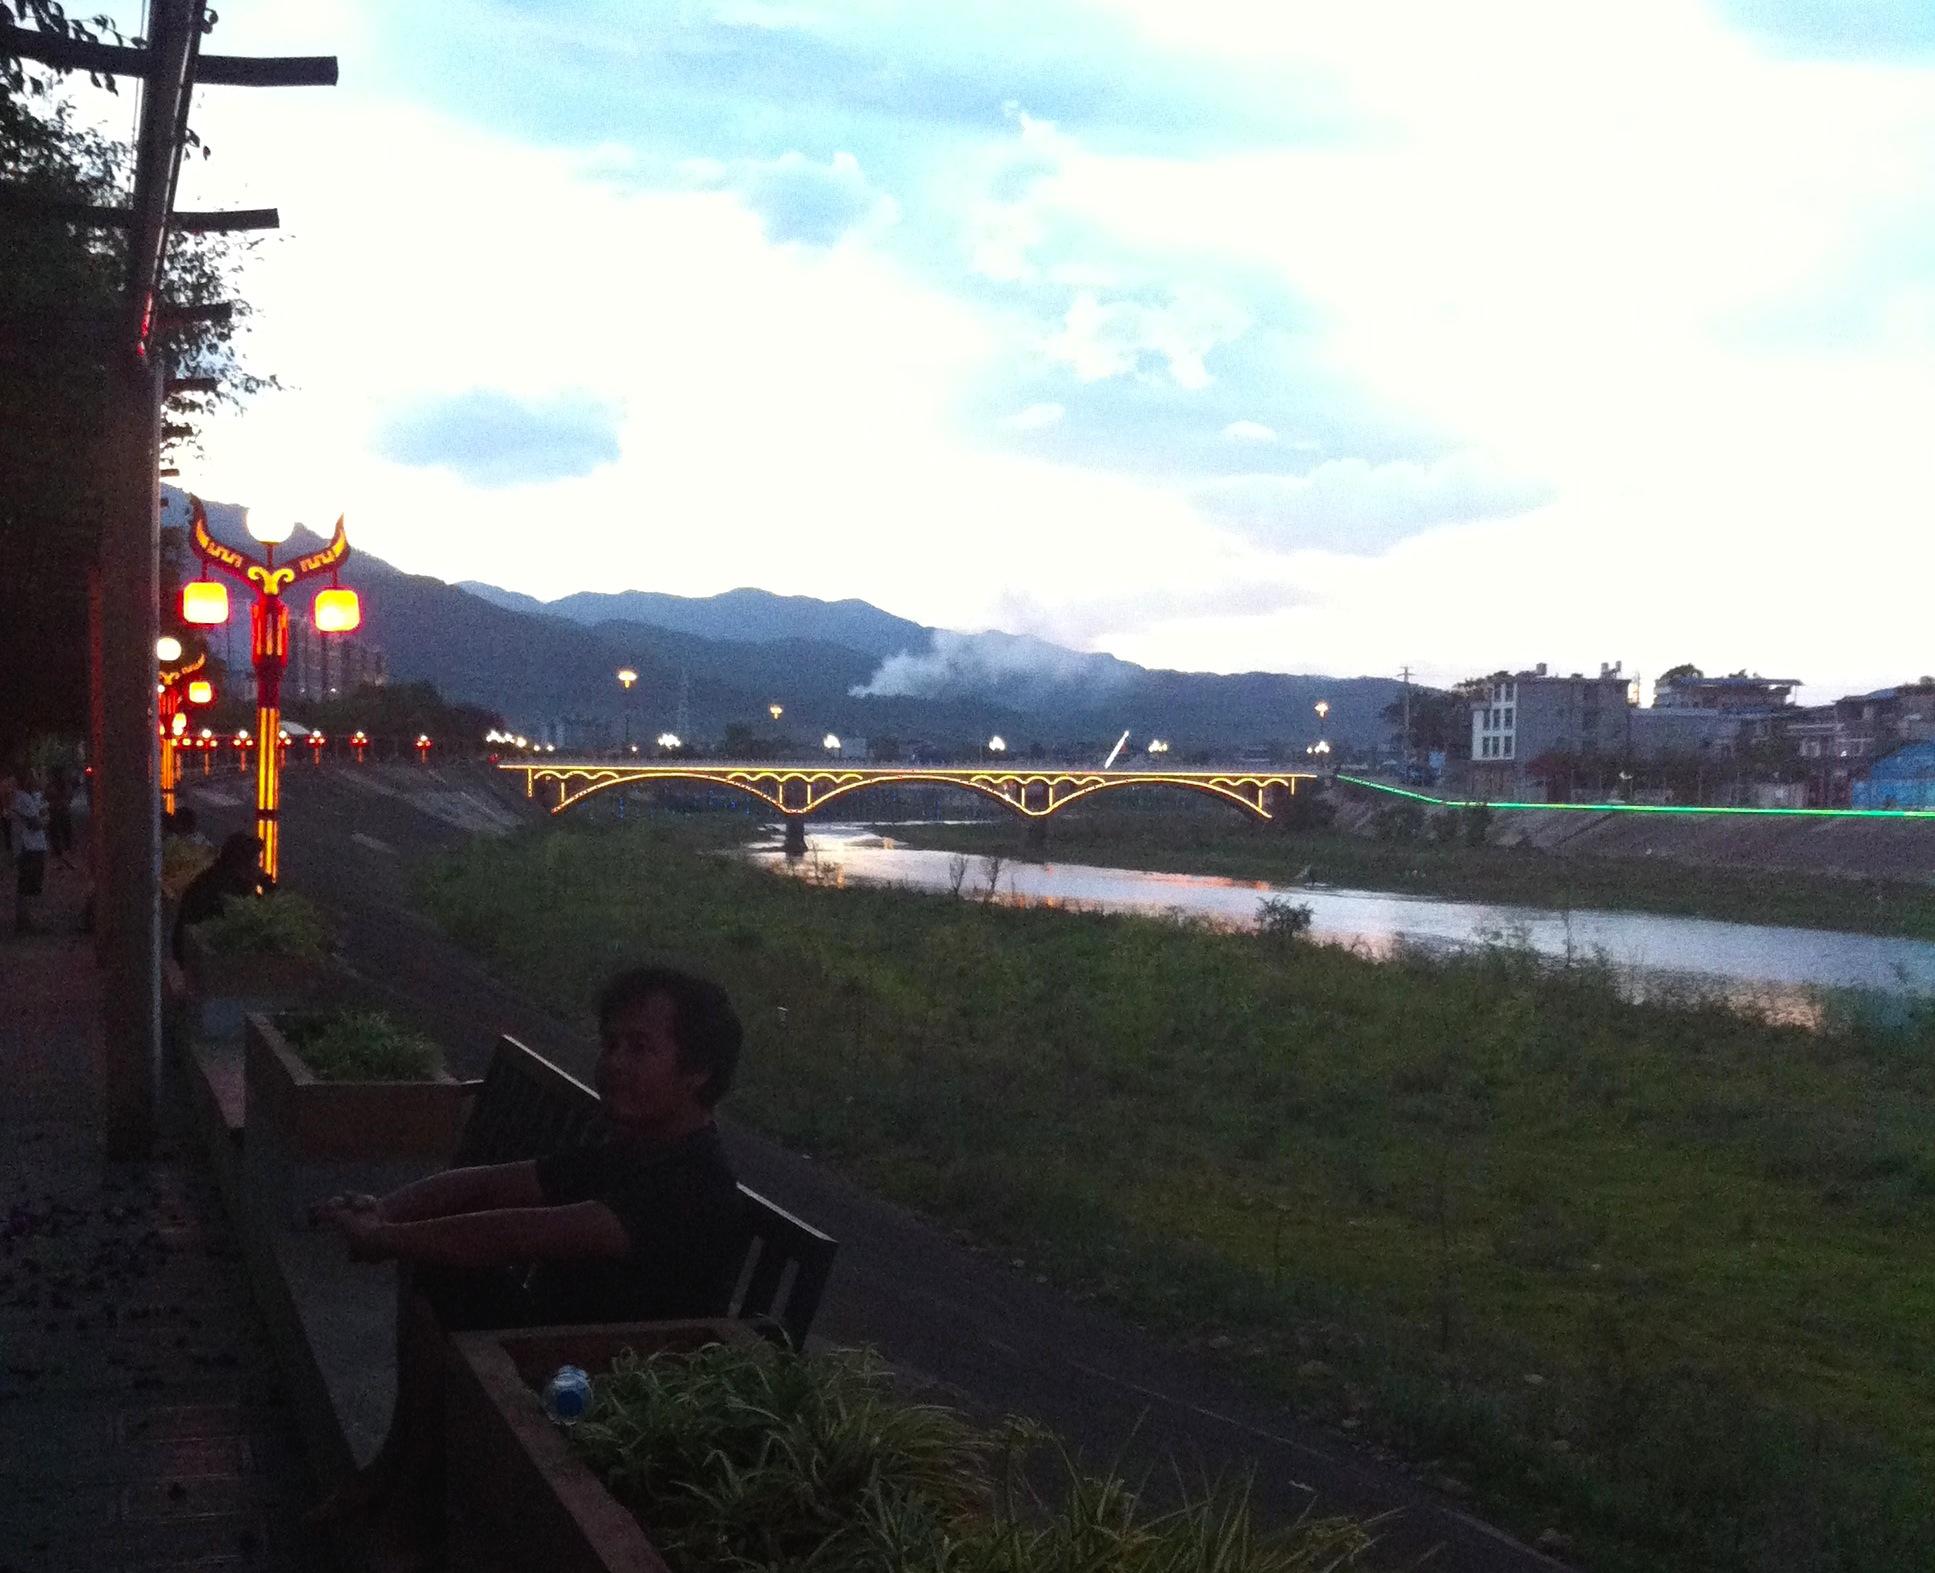 Jingdong's riverside promenade